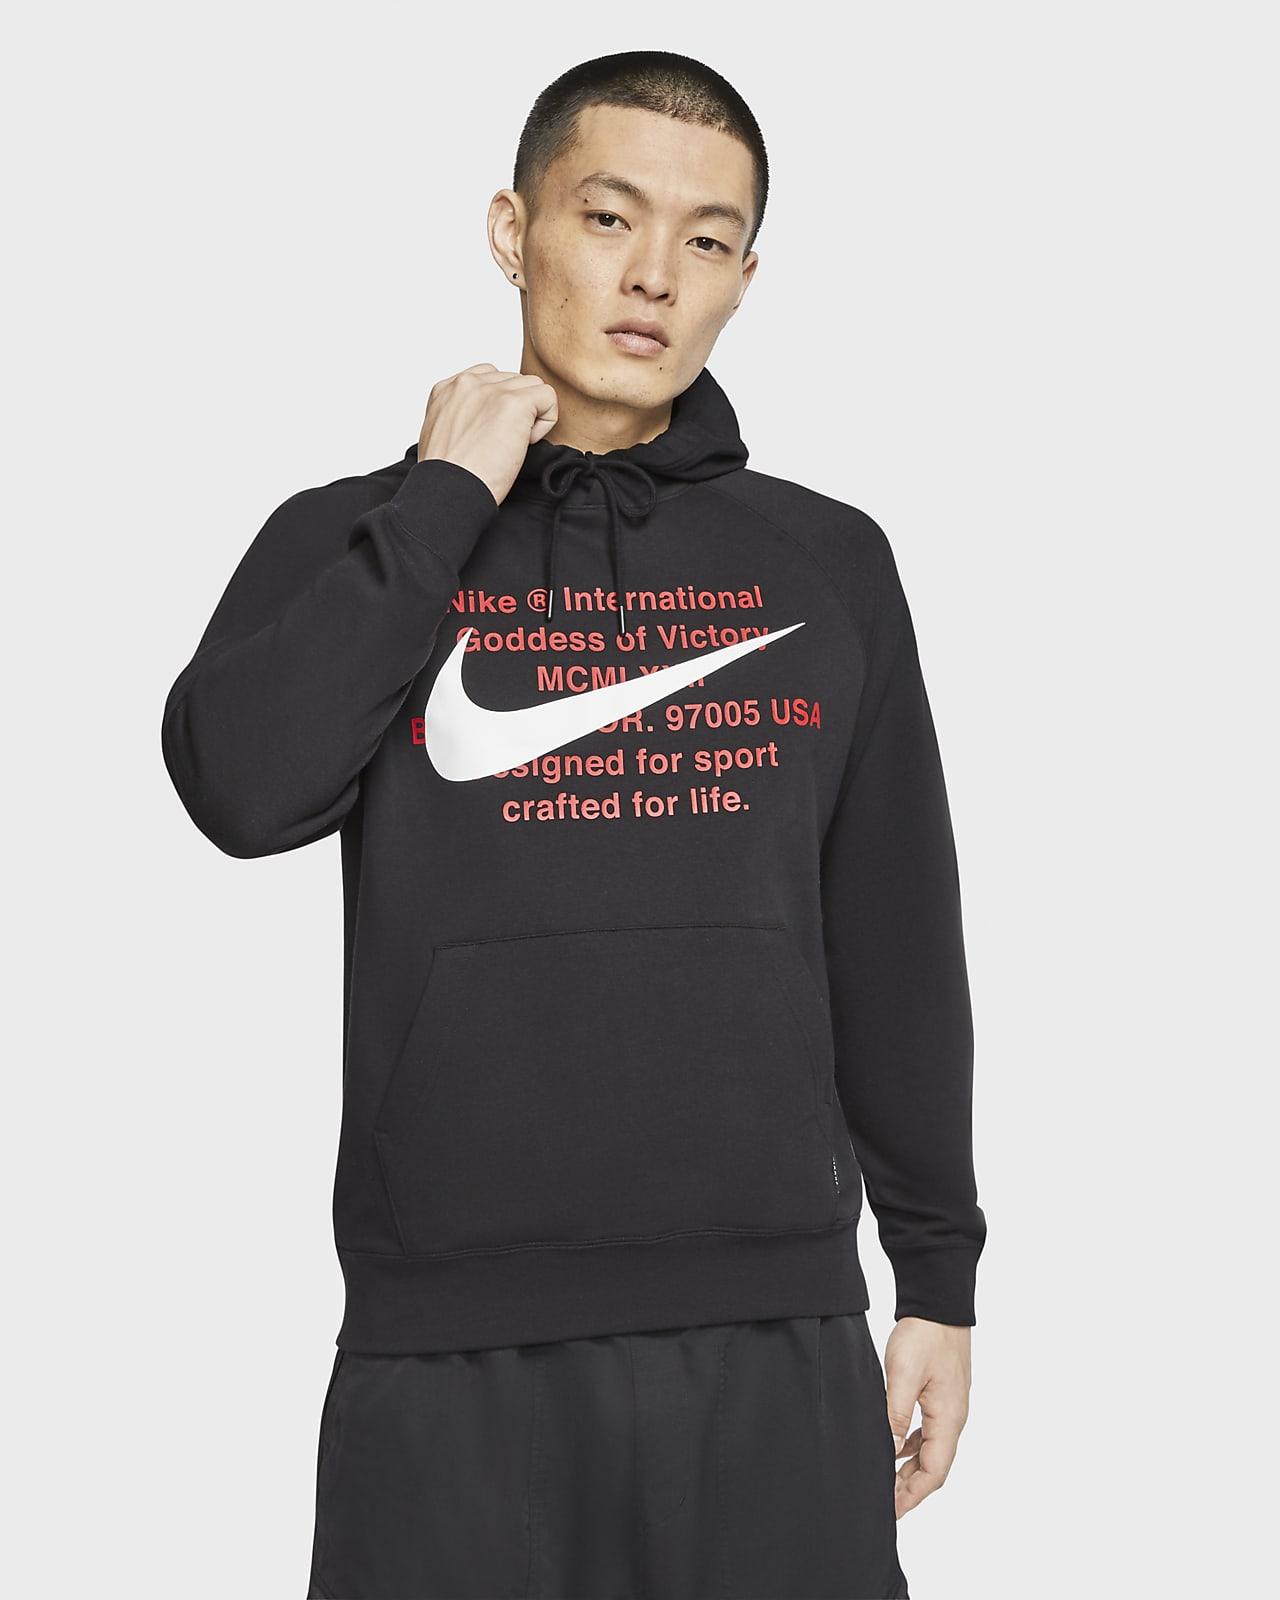 Sobrevivir Pizza Miedo a morir  Nike Sportswear Swoosh Men's French Terry Pullover Hoodie. Nike ID